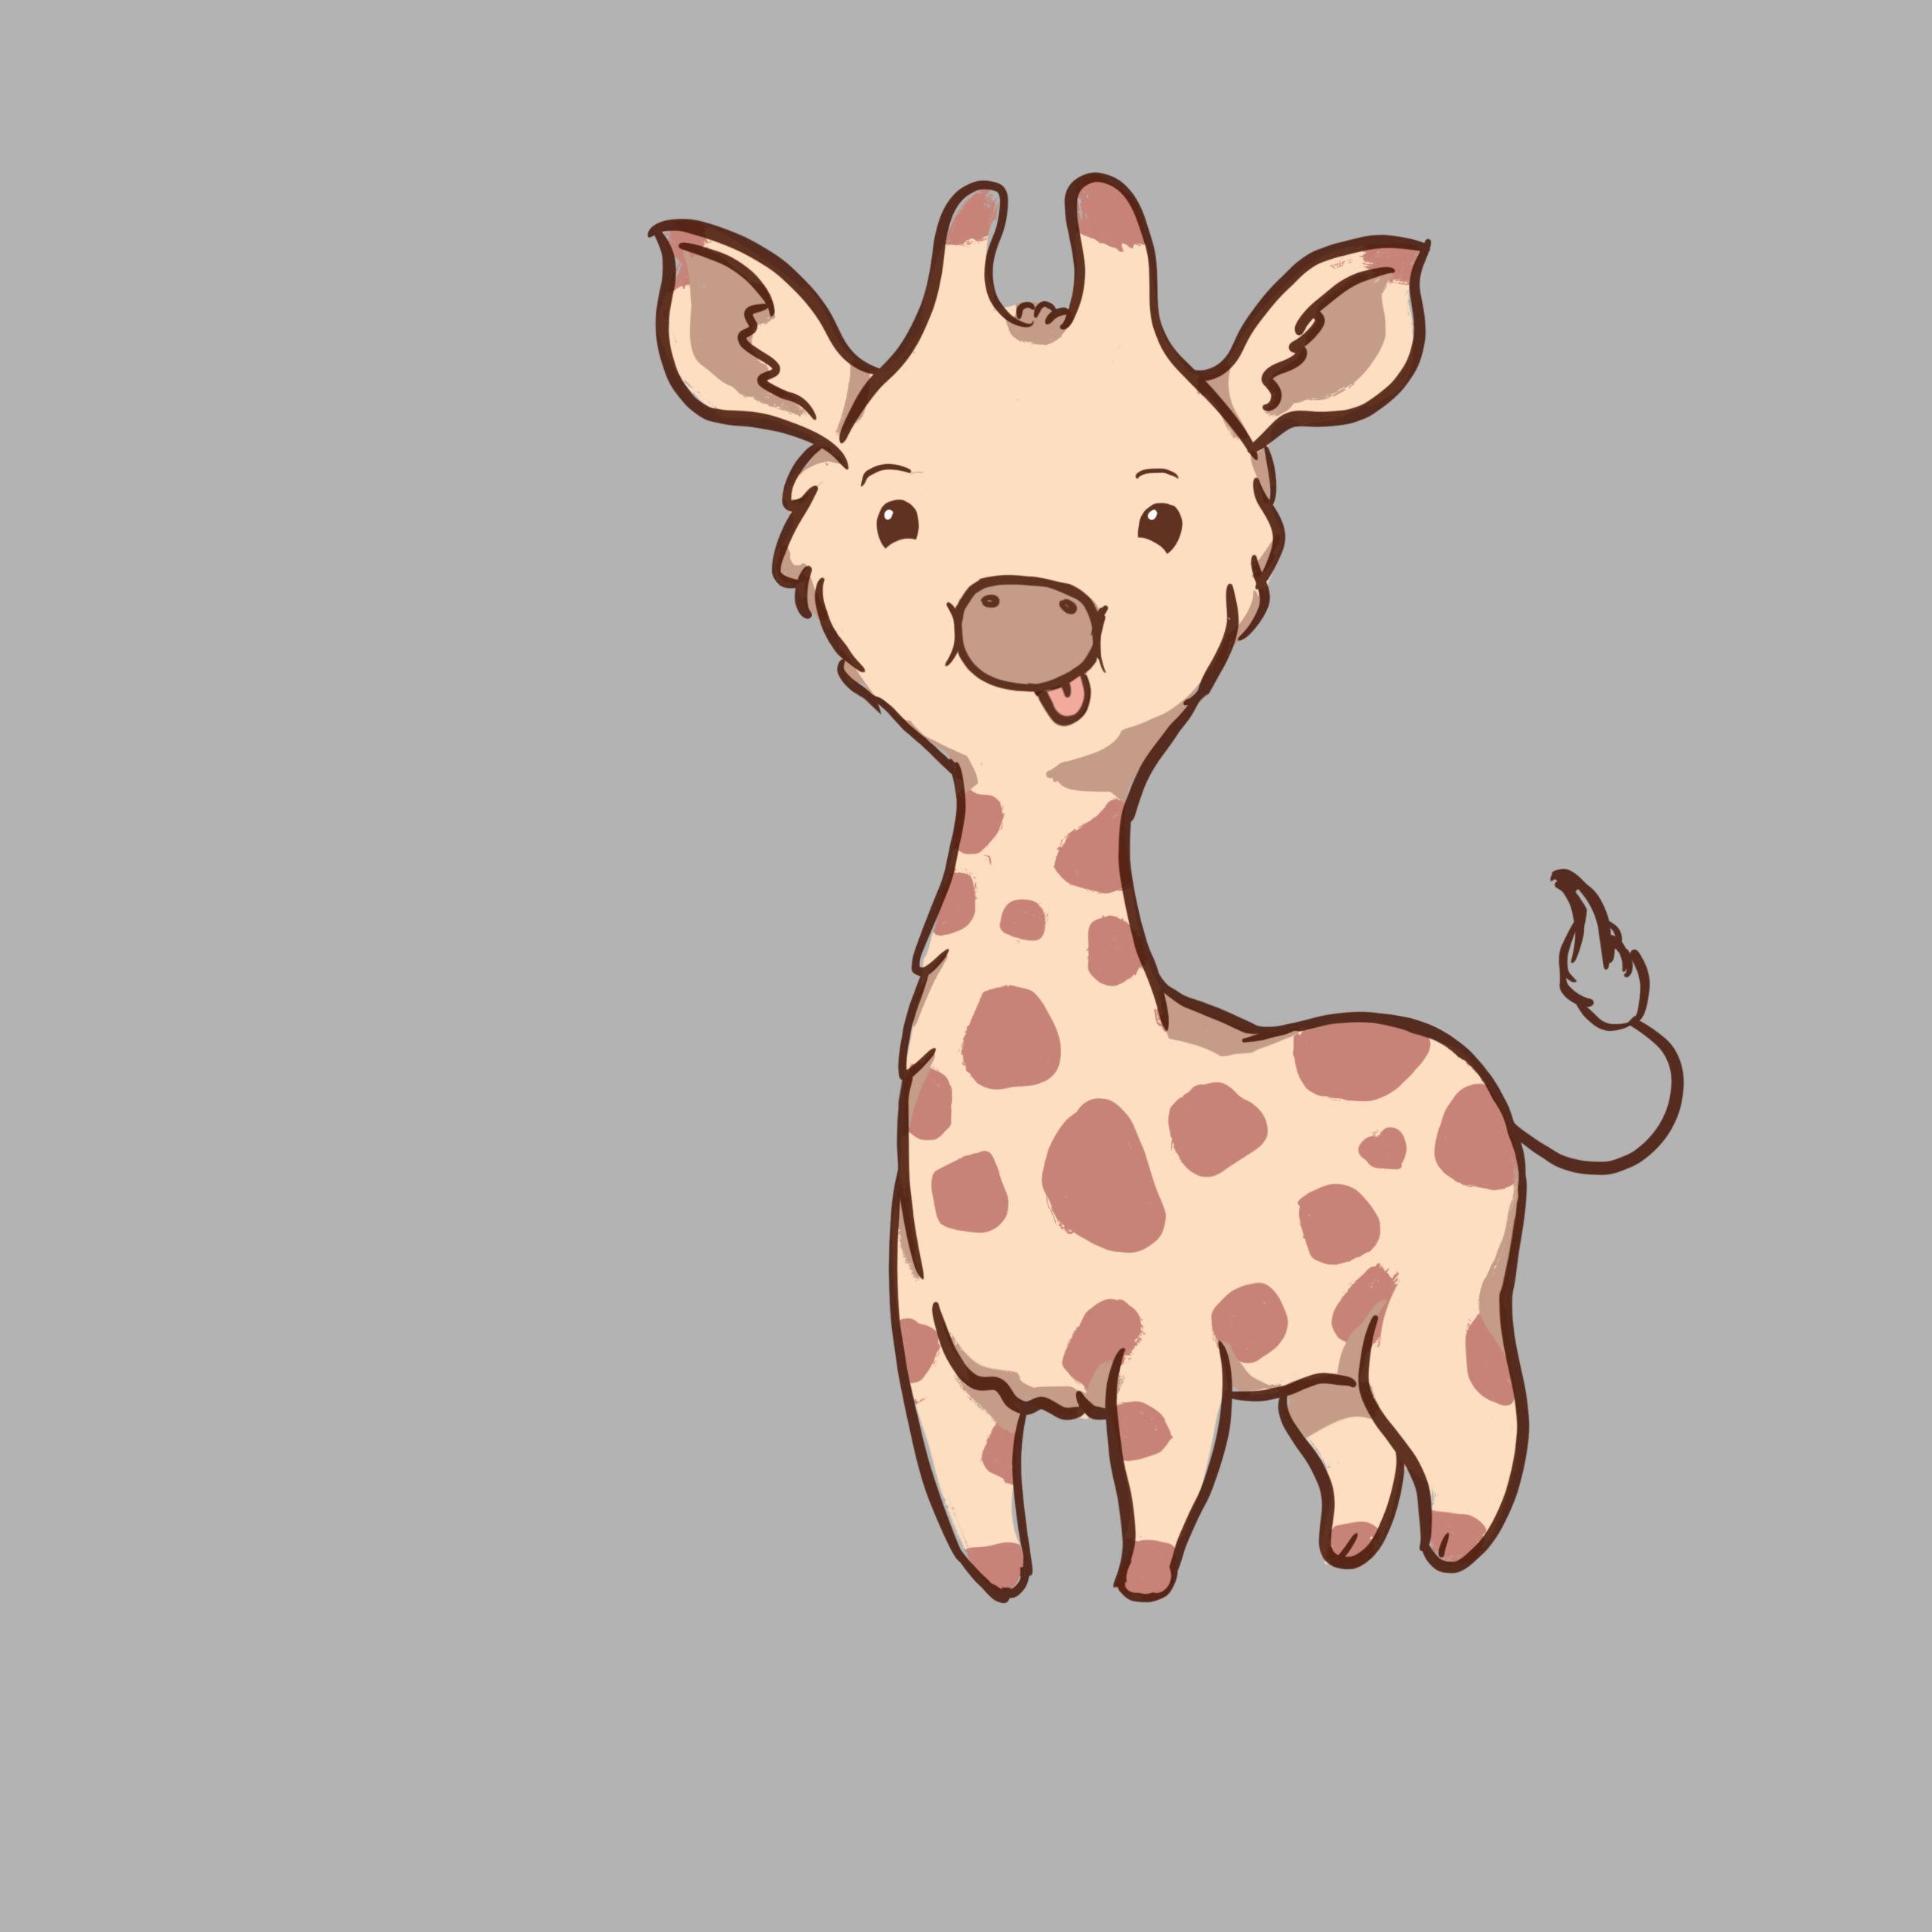 dailyui_008_404_gfk_giraffe